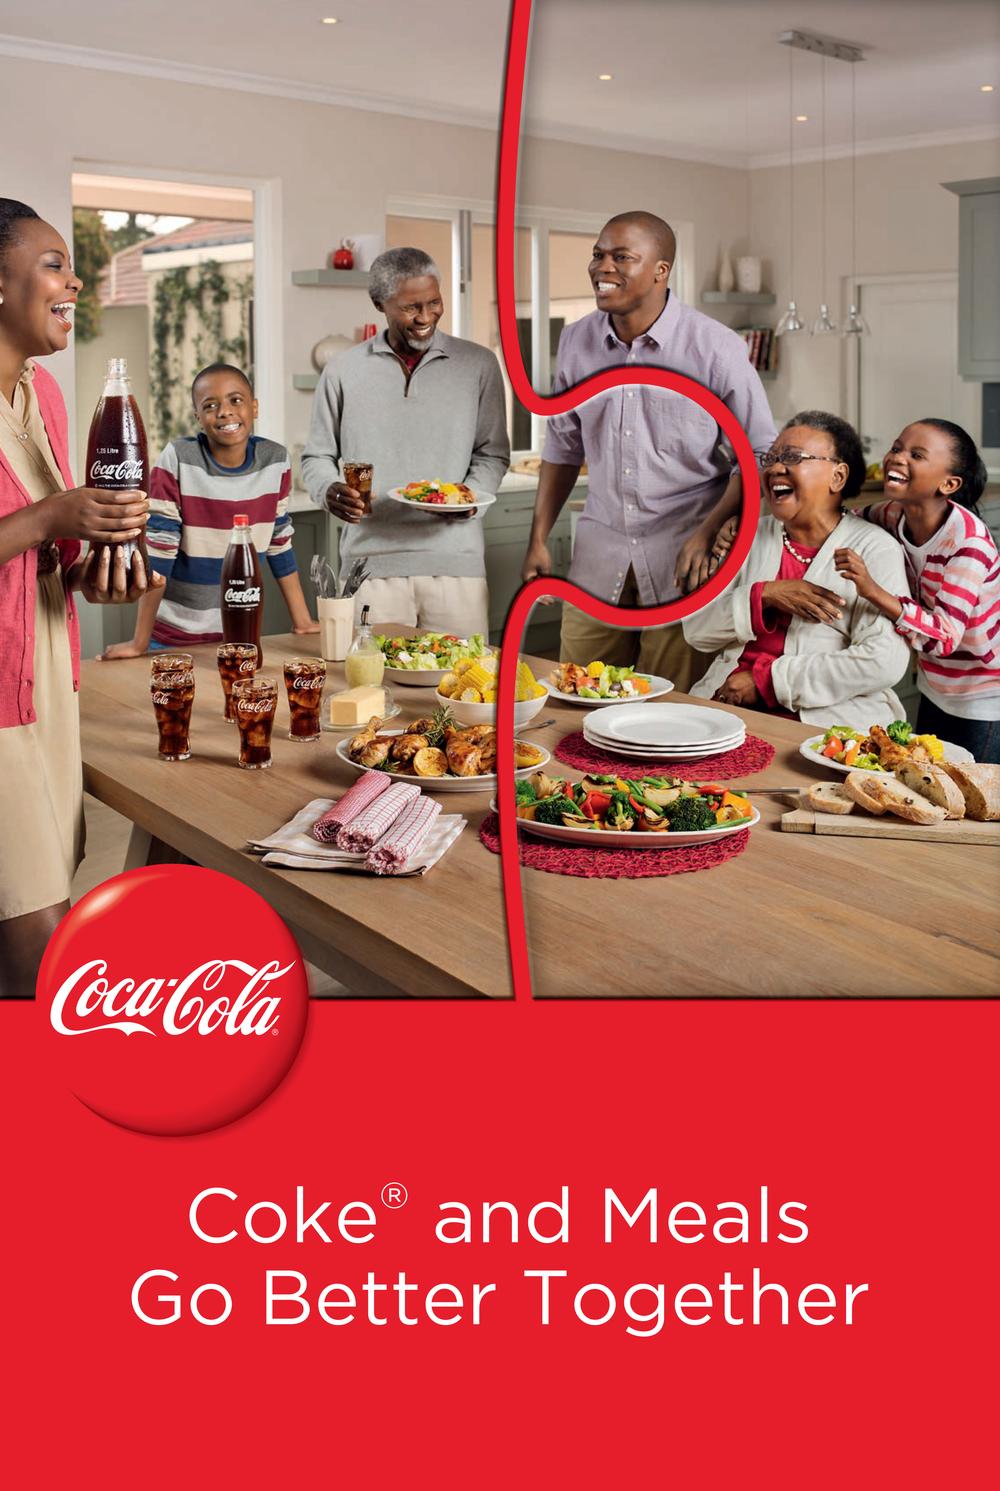 Coke & Meals - OOHbsmall.jpg